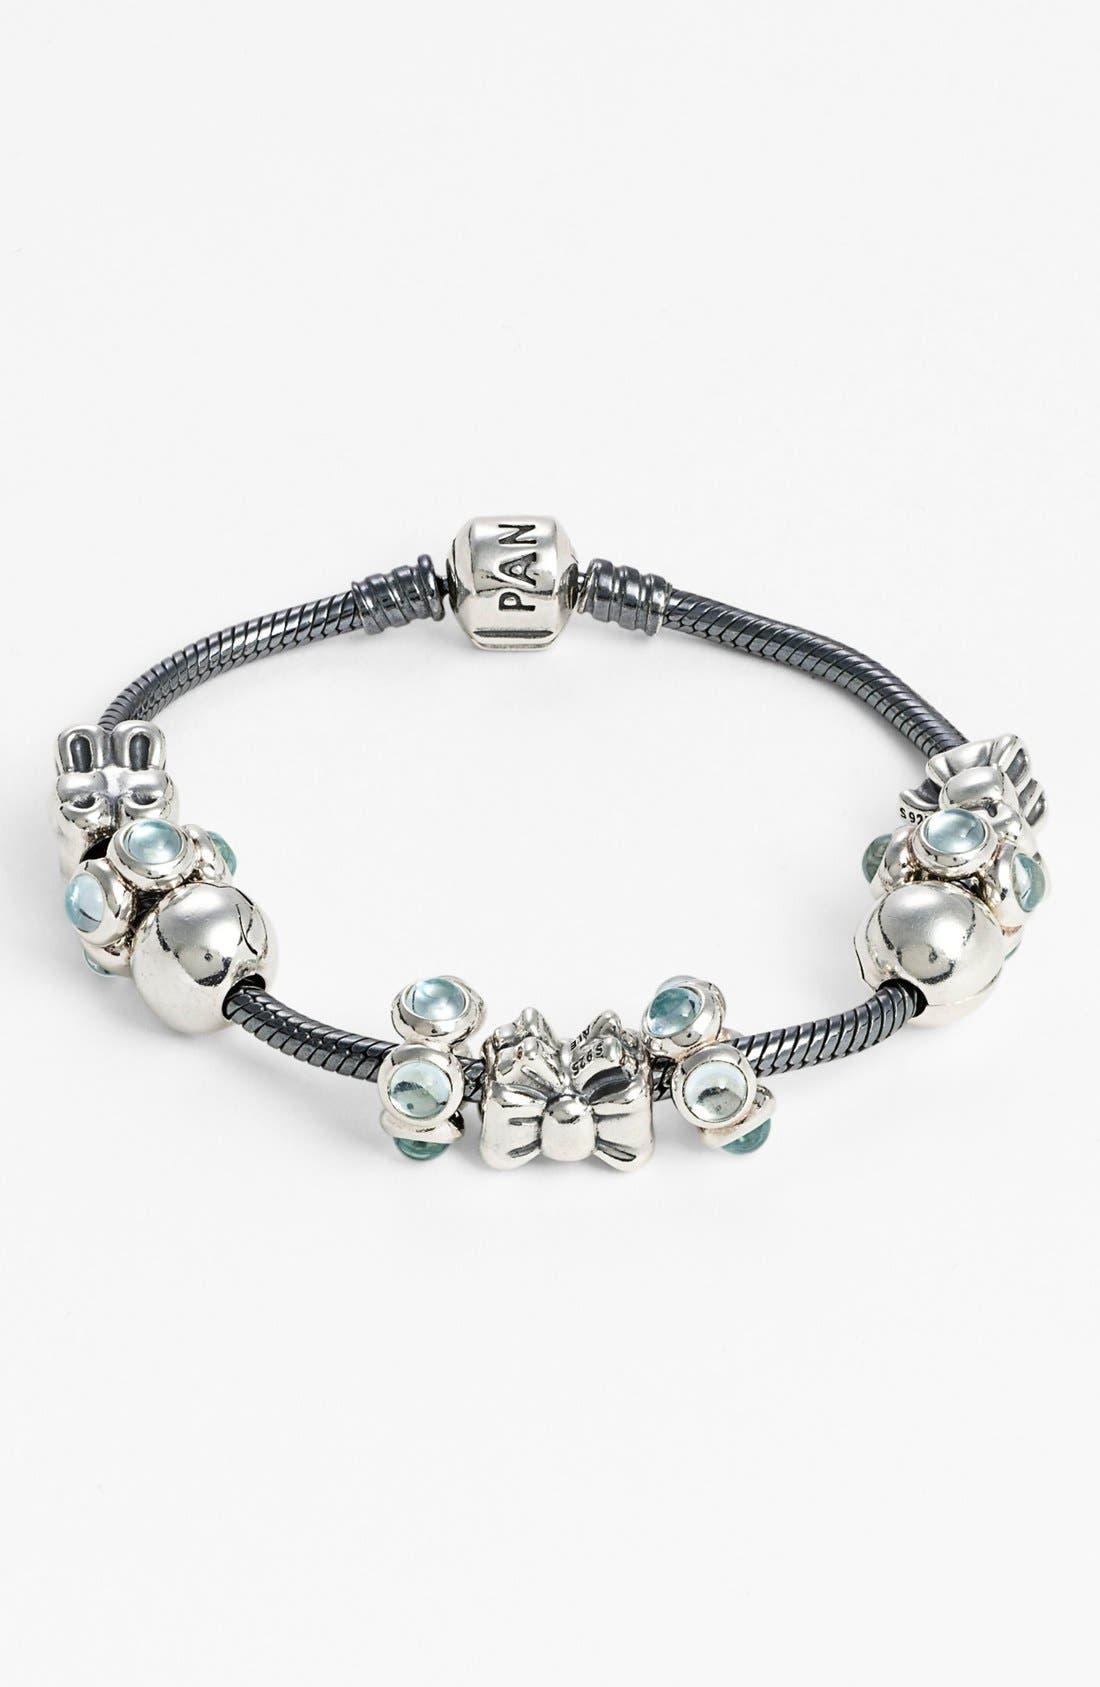 Oxidized Sterling Silver Charm Bracelet,                             Alternate thumbnail 3, color,